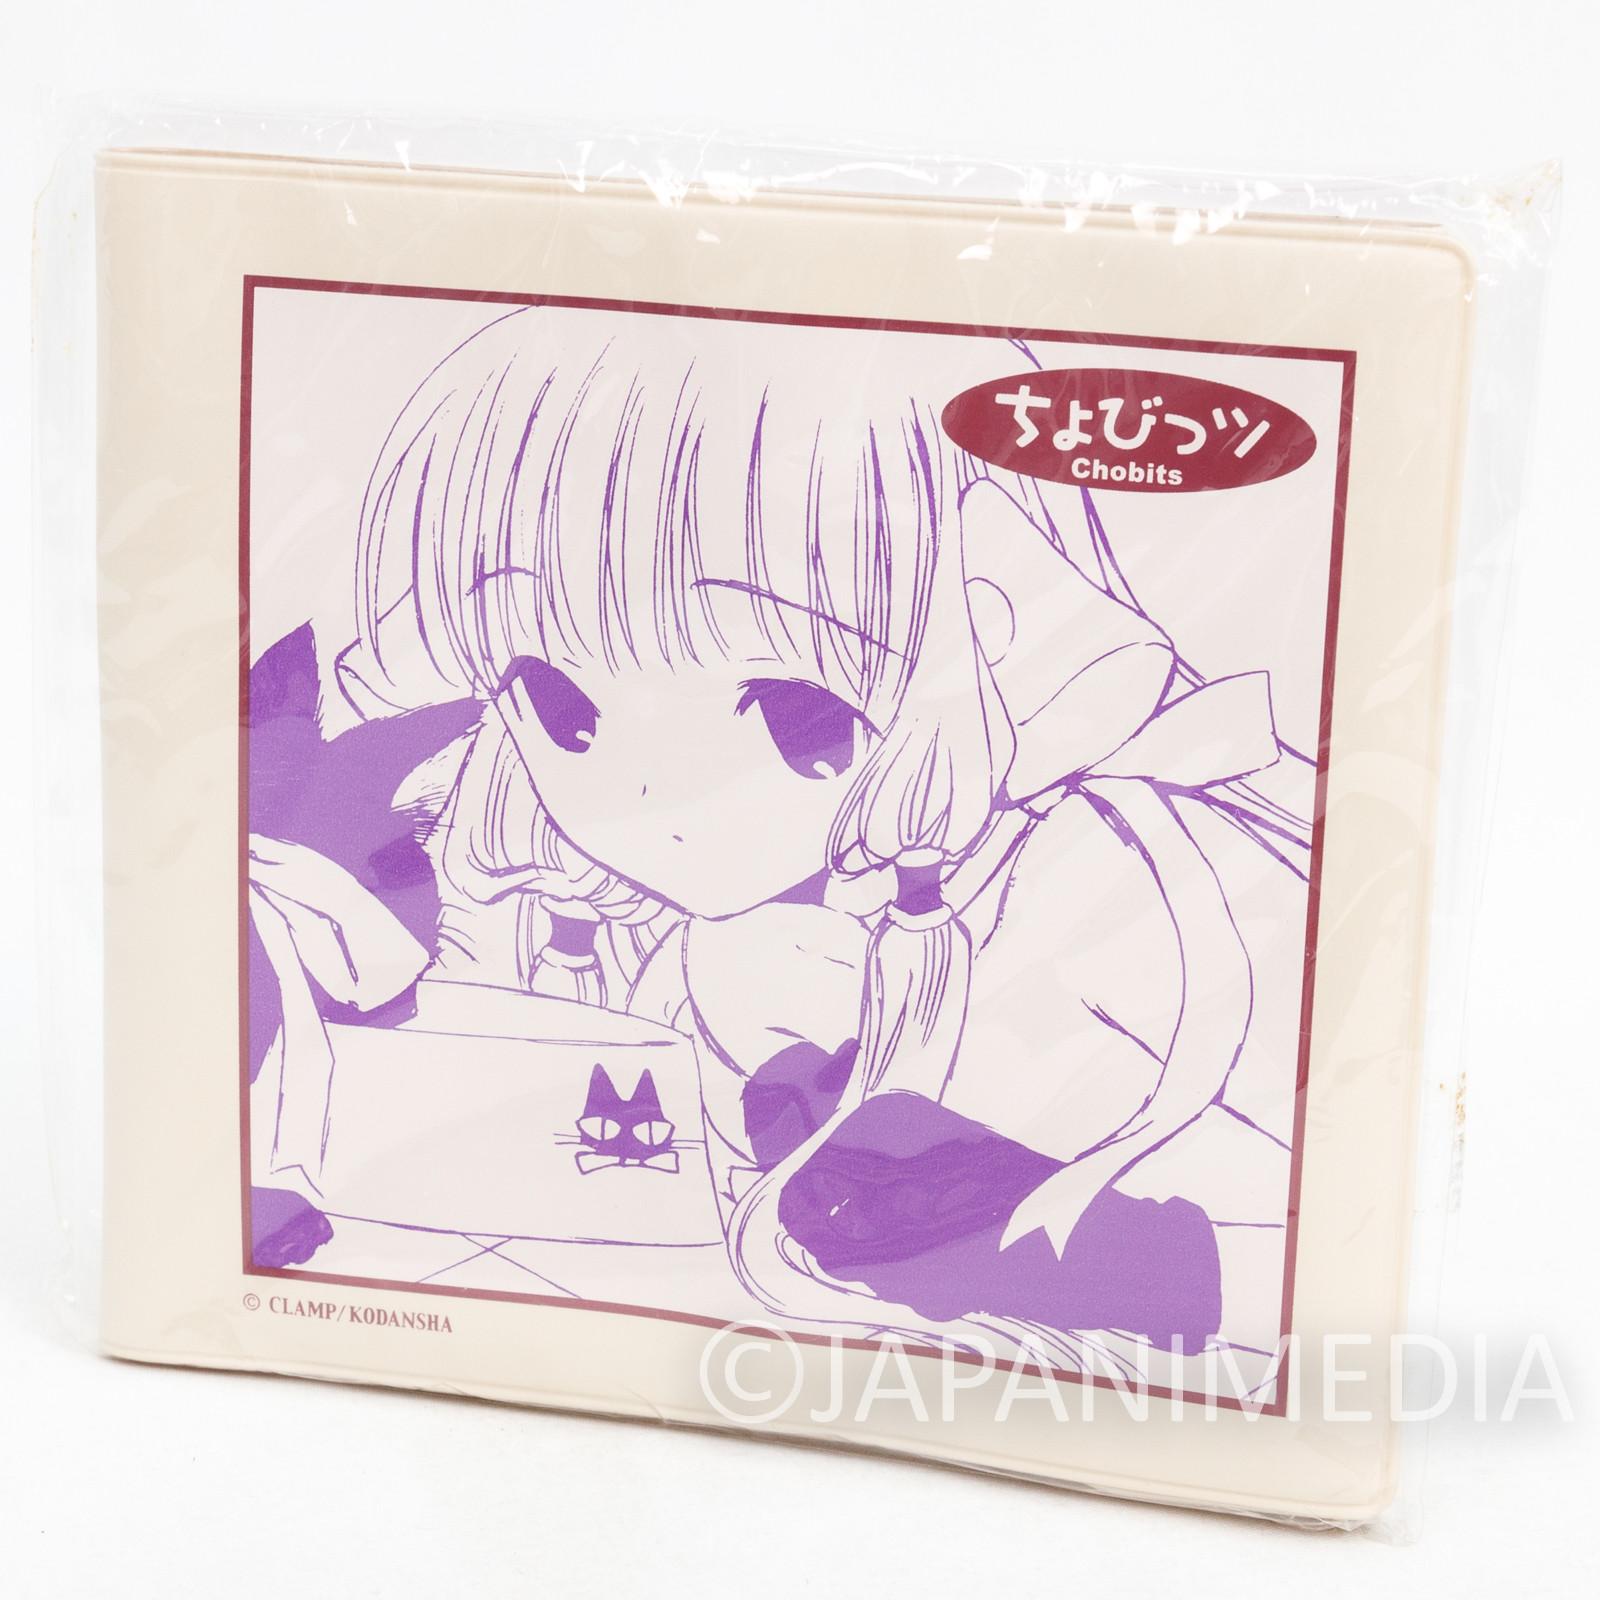 Chobits Cat Chii MO Disk Case Holder CLAMP JAPAN ANIME MANGA